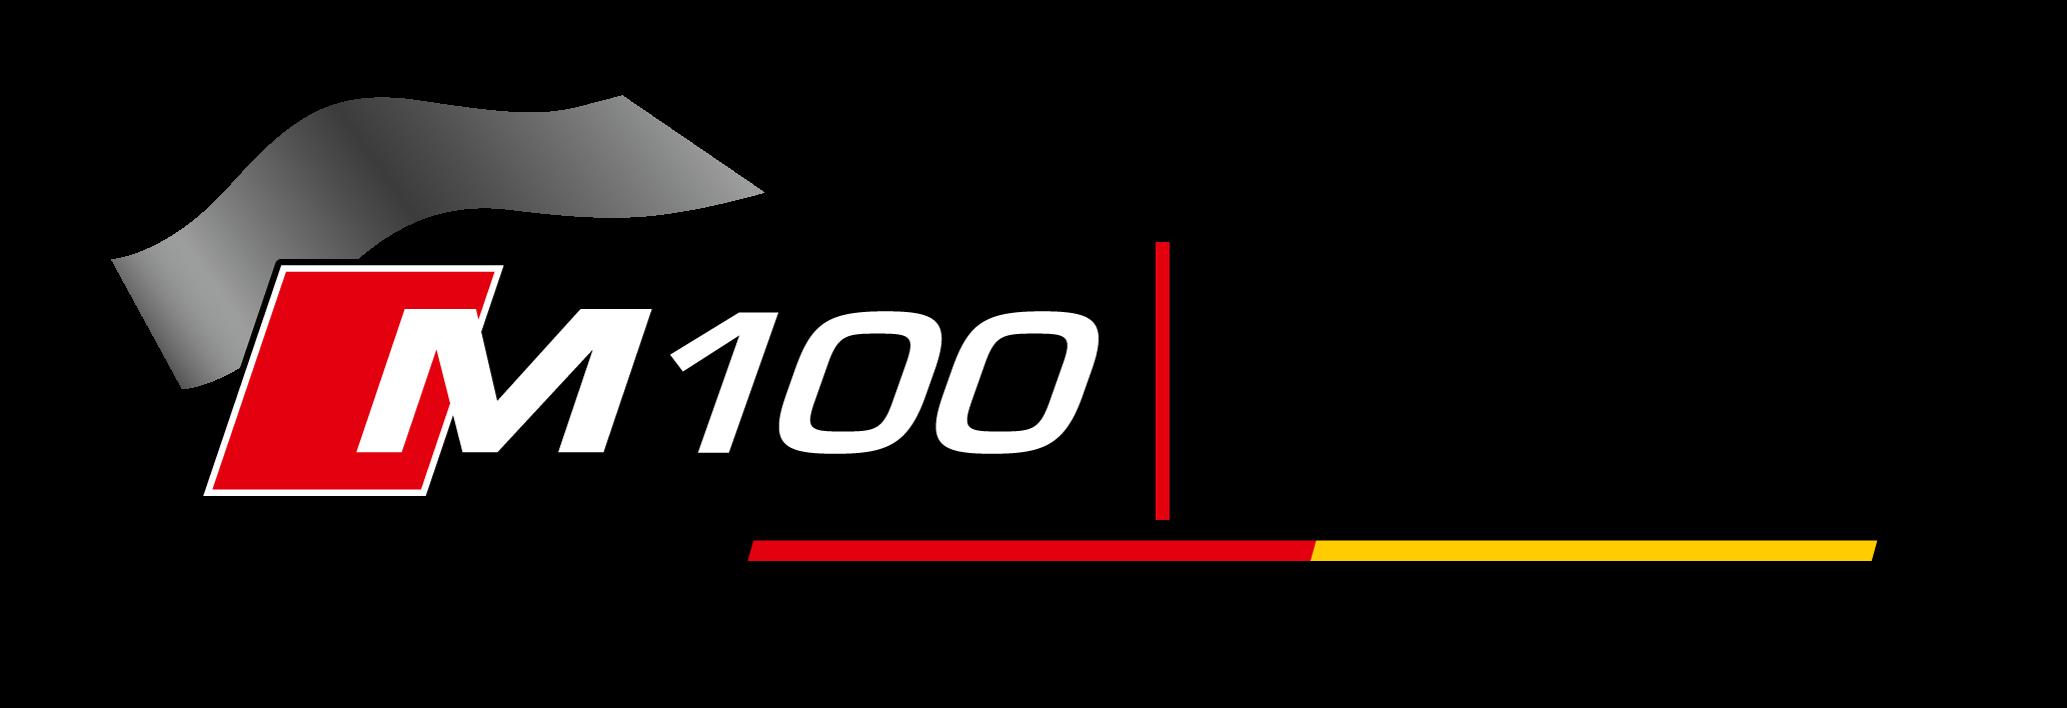 mth-19001_logo_m100_germany_aufweiss_rz